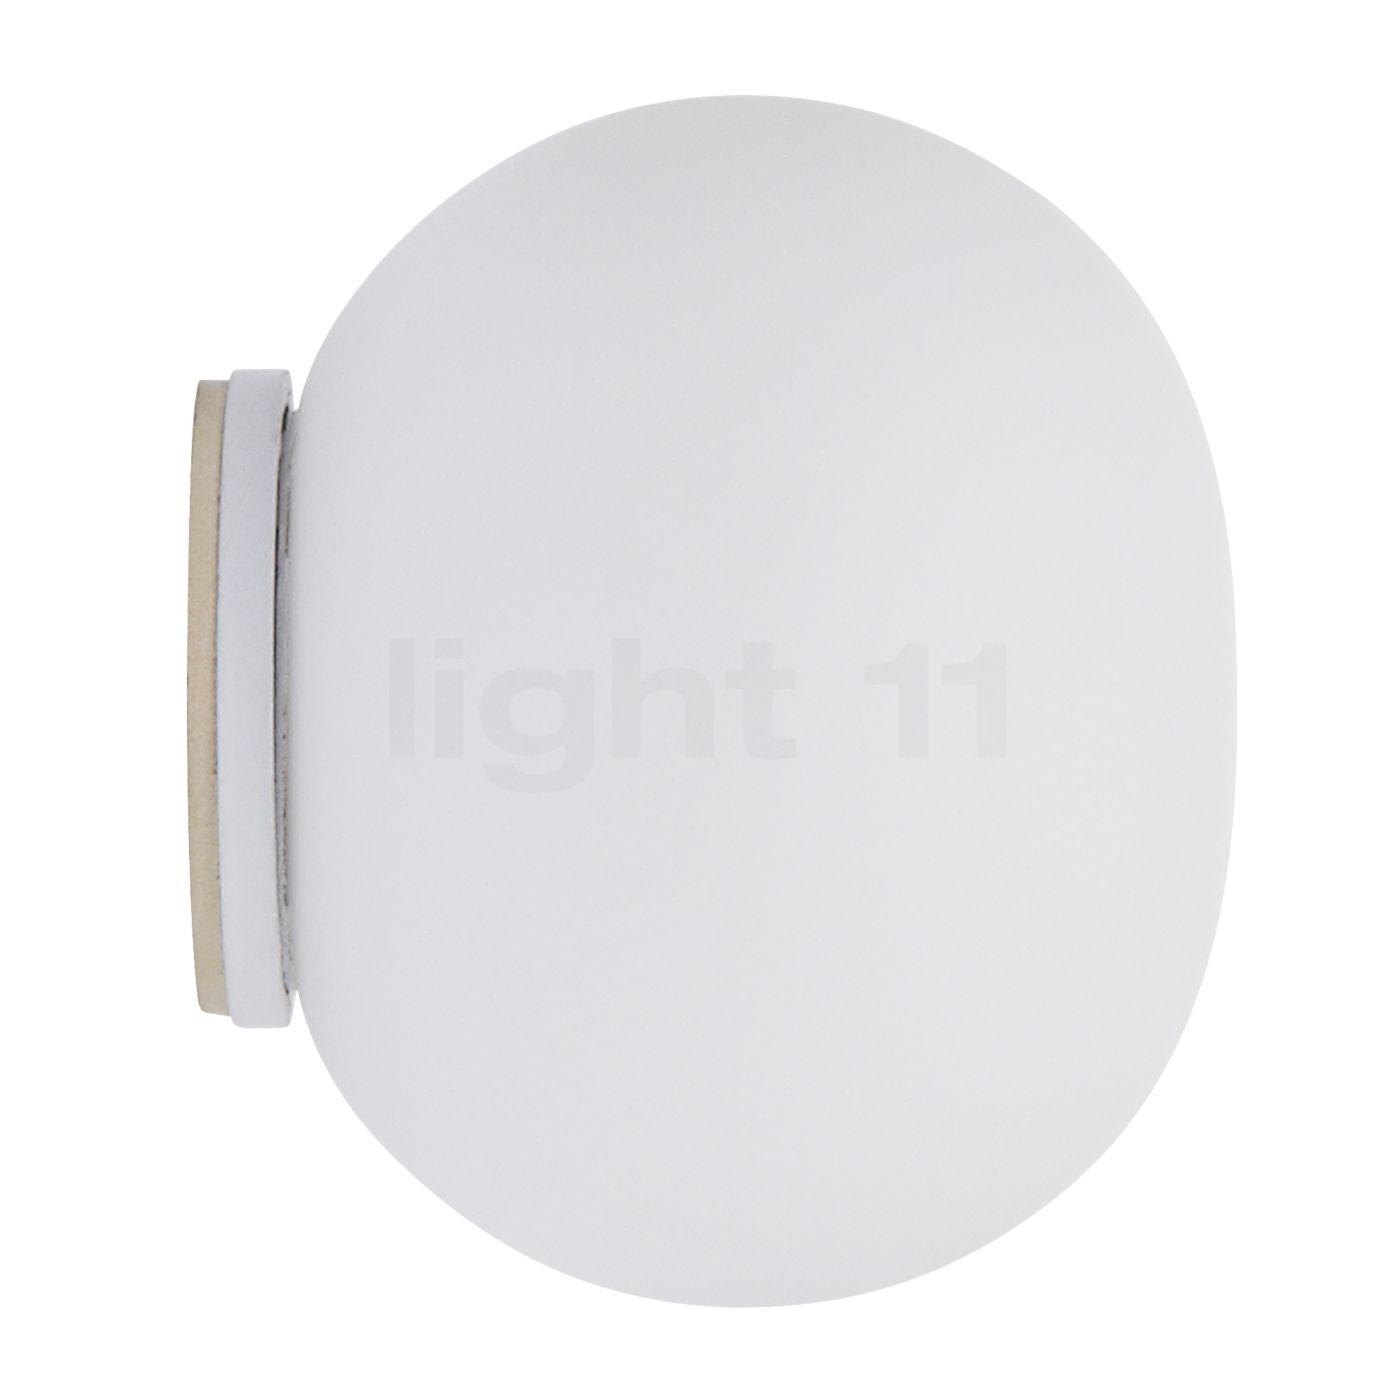 Flos Glo-Ball Mini C/W IP44 kaufen bei light11.de